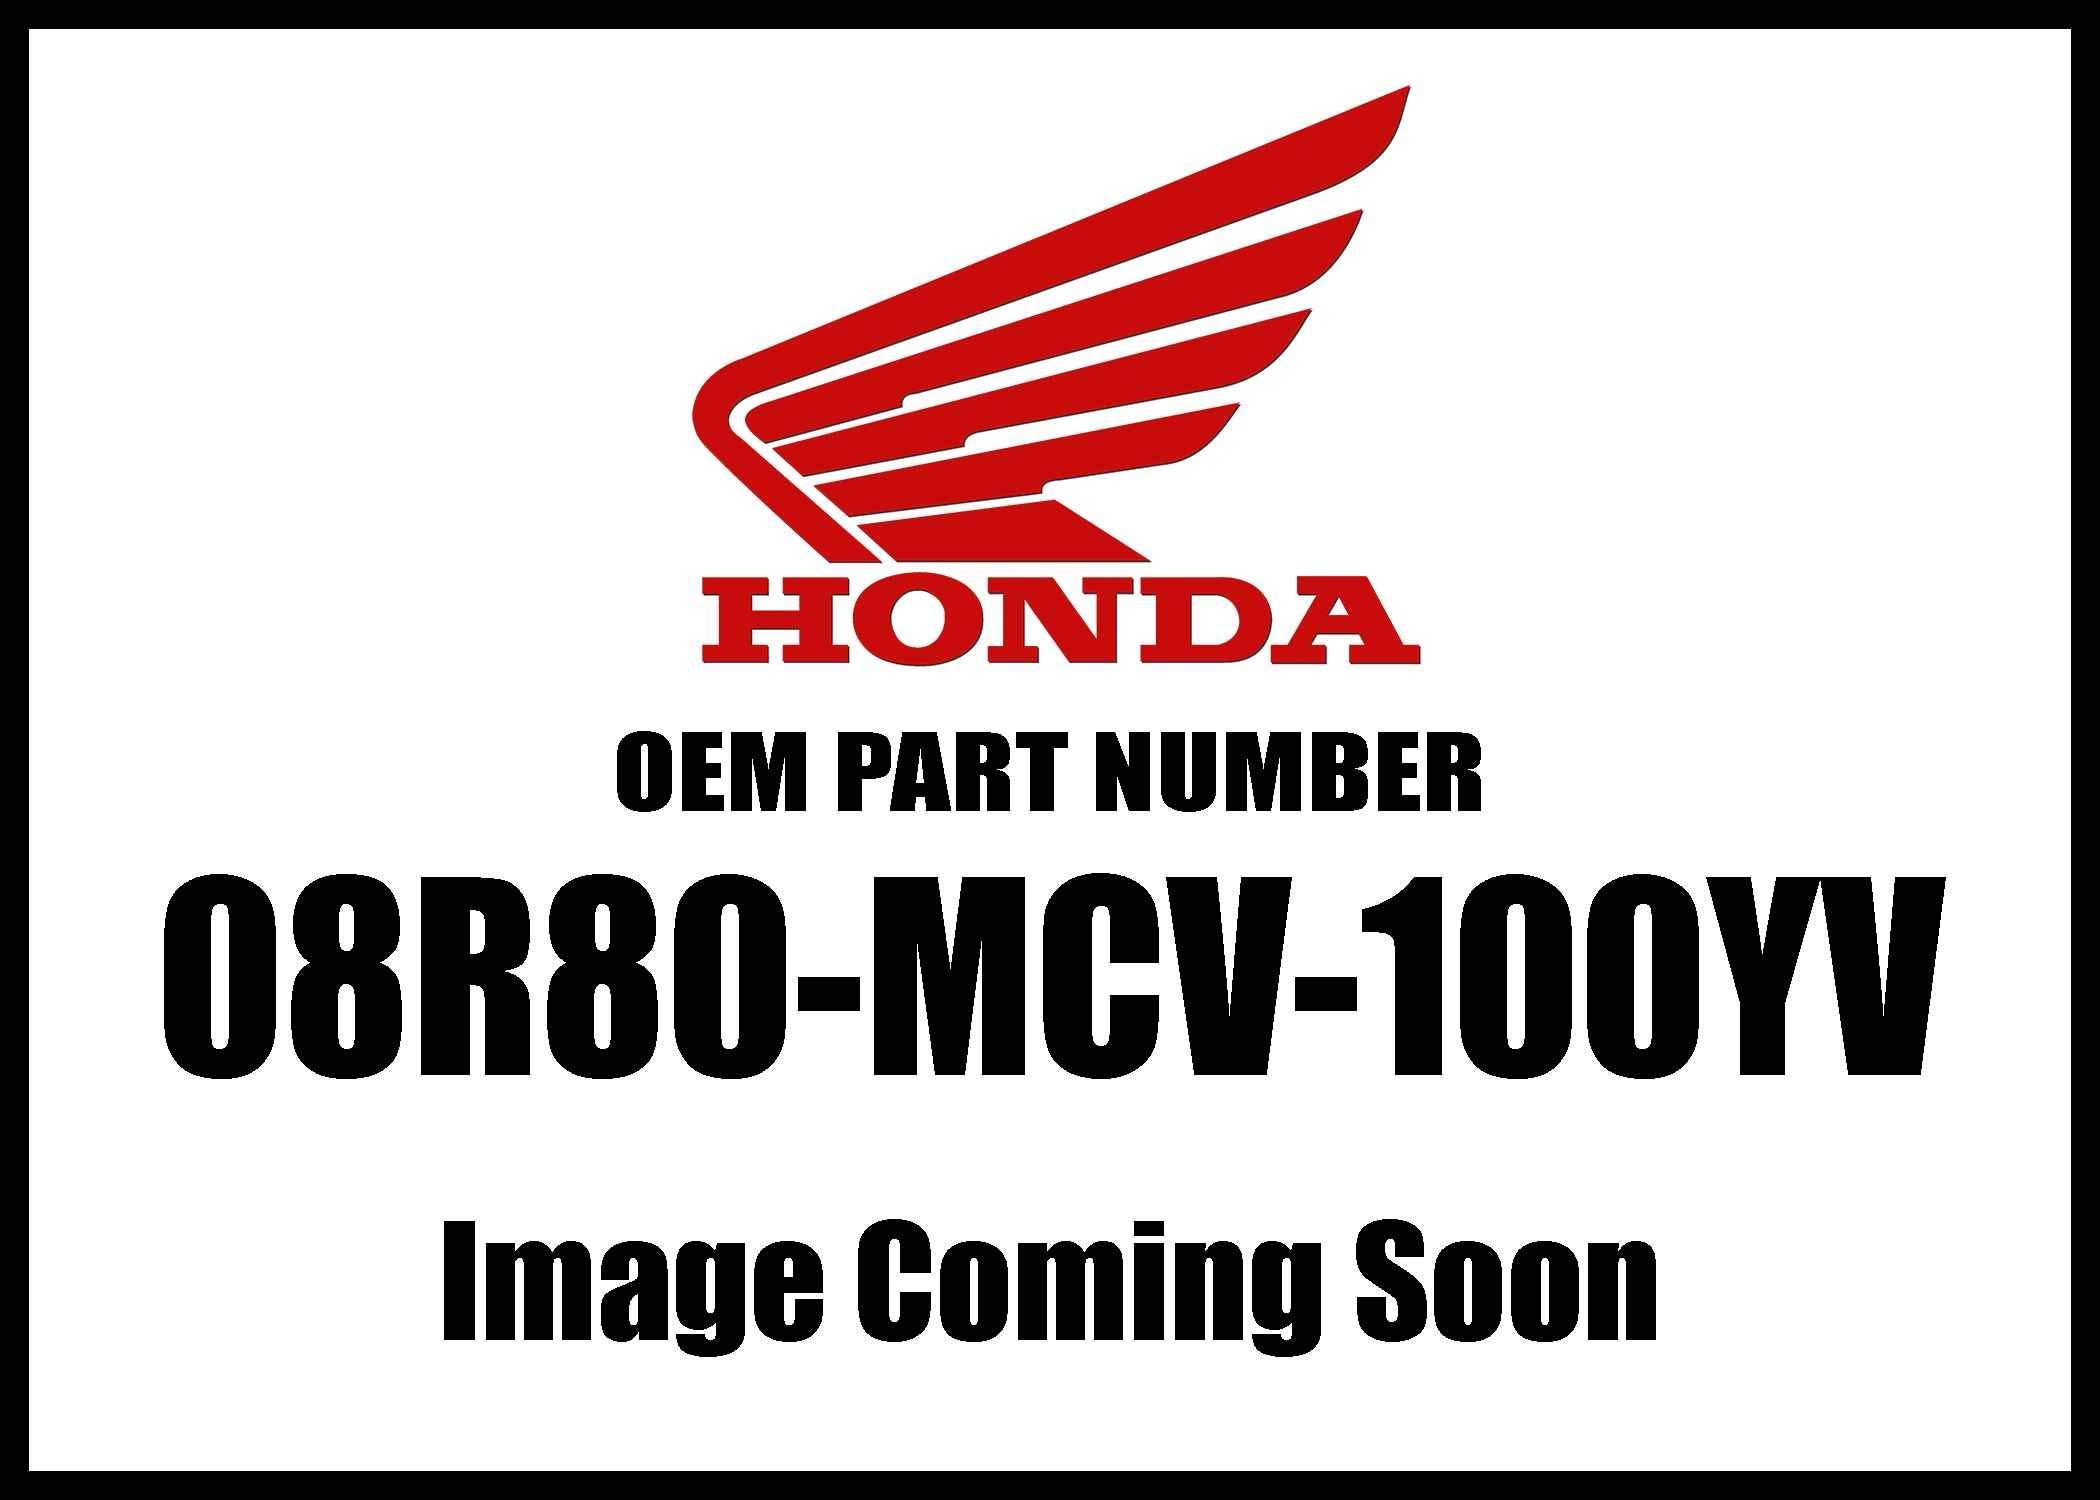 Honda Po# 721J Screw 6X19 Sub Ki 08R80-Mcv-100Yv New Oem